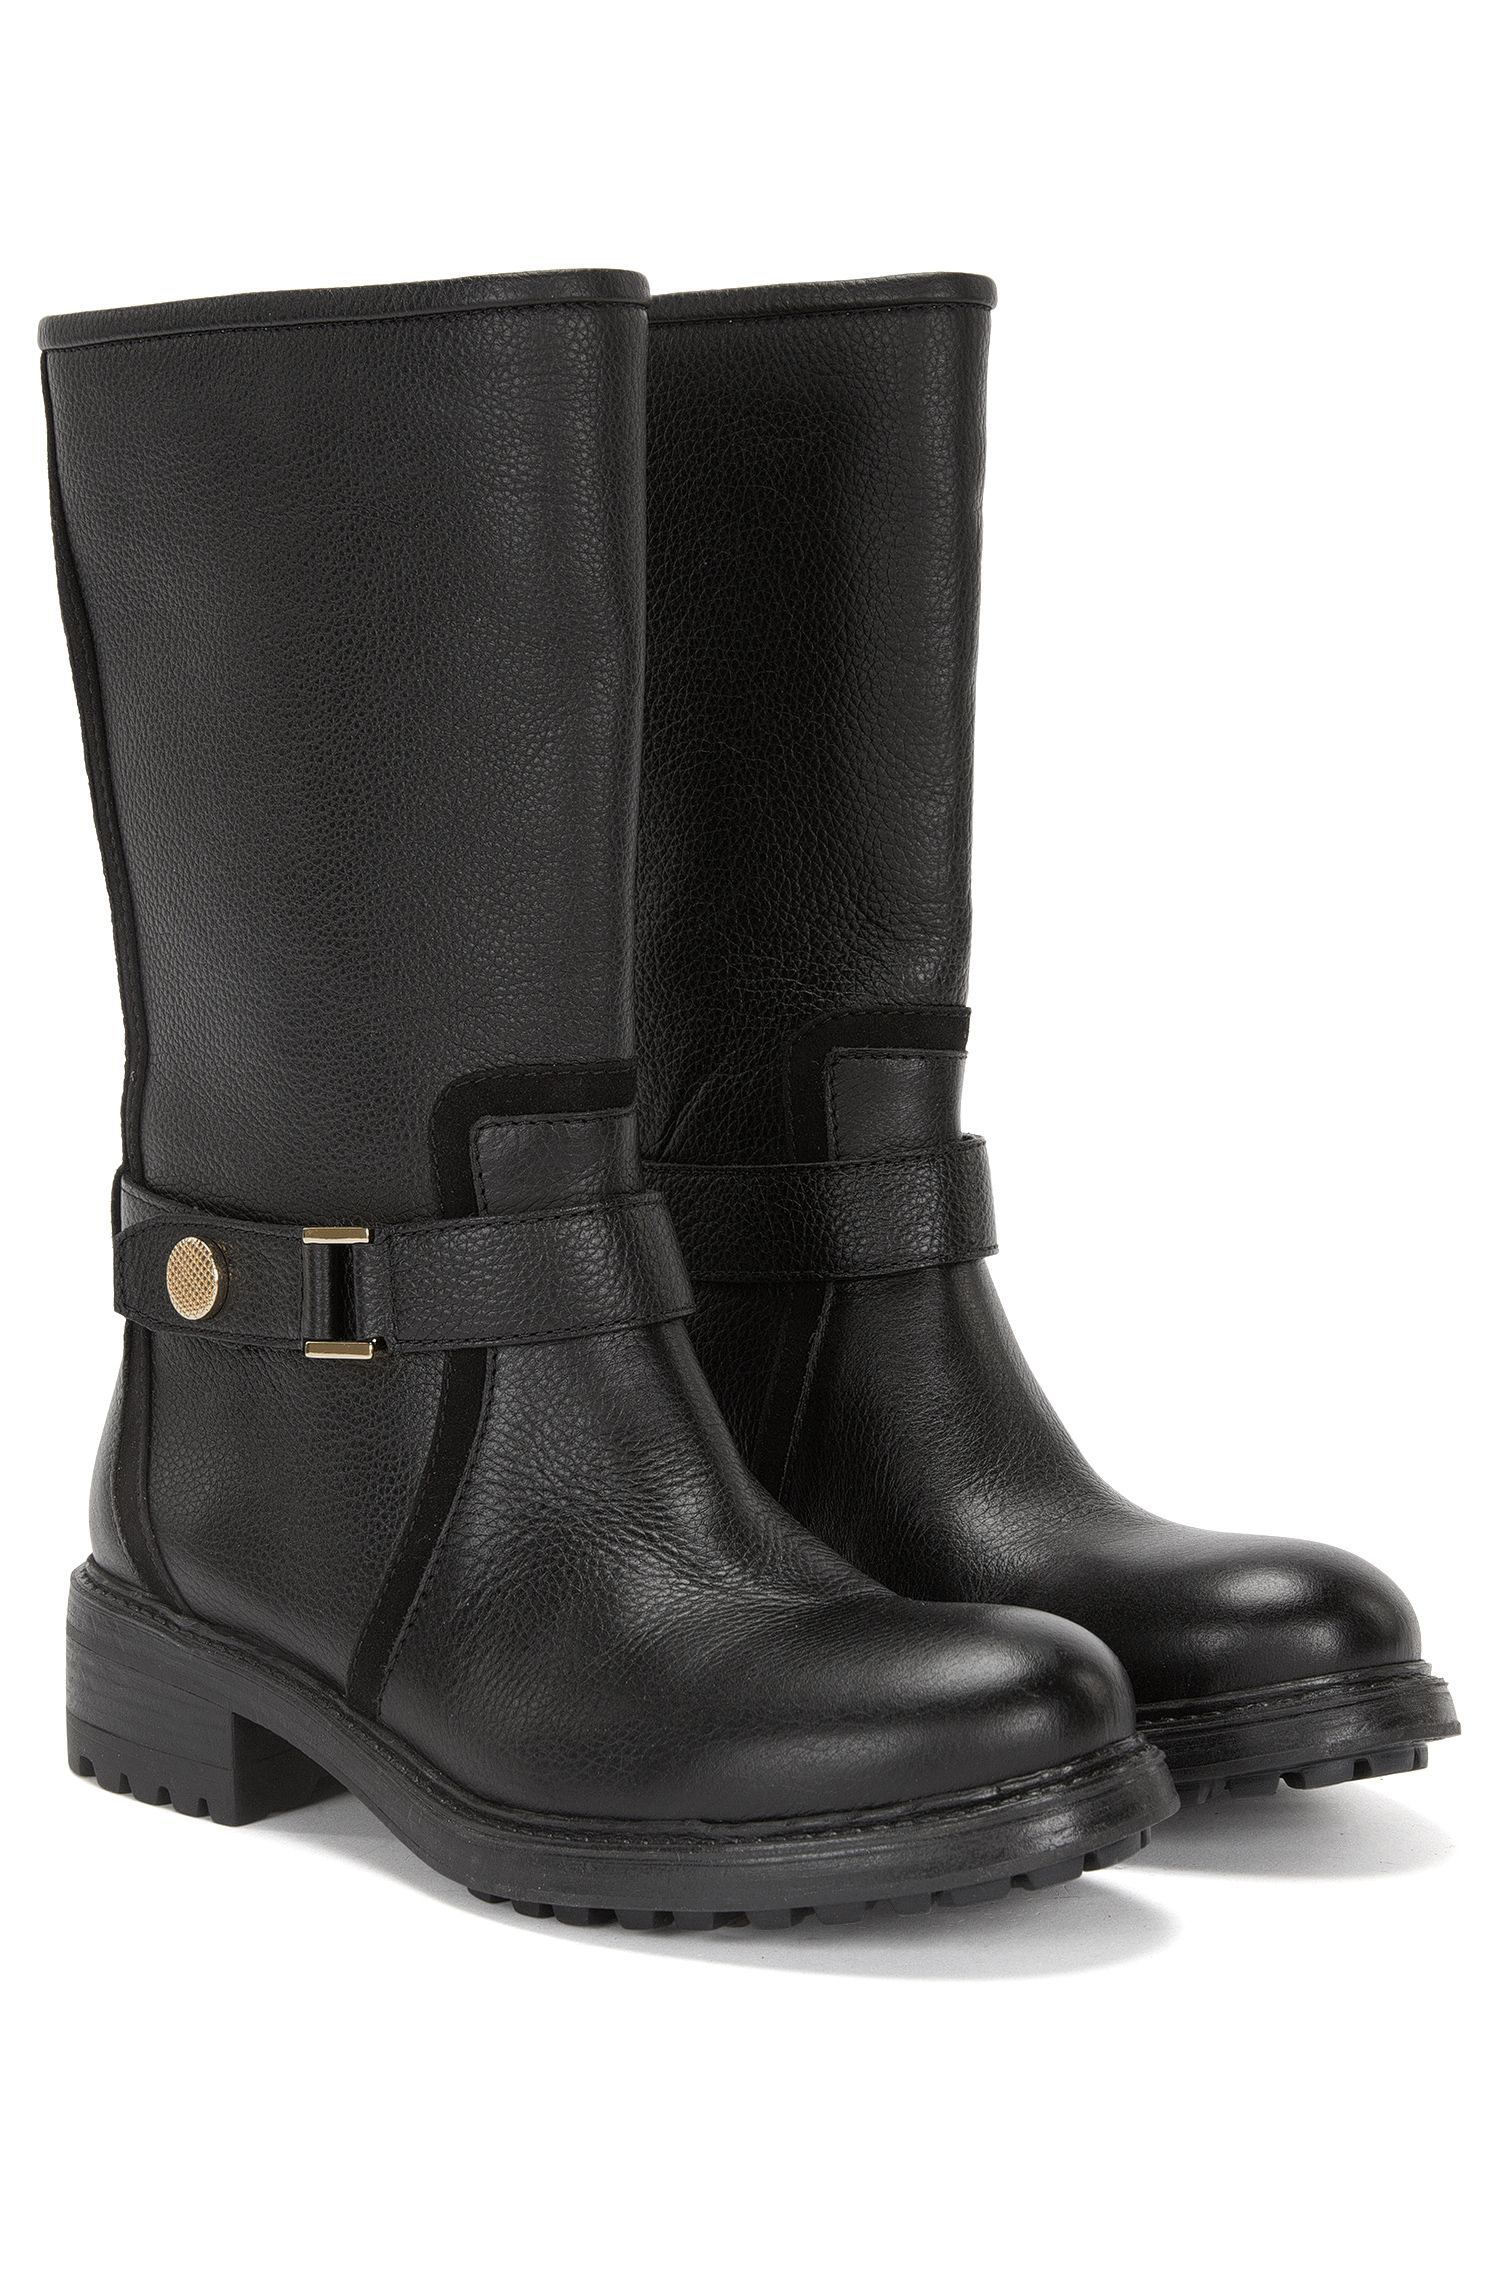 Boots aus Leder mit dekorativem Riegel-Element: 'Eduard-G'